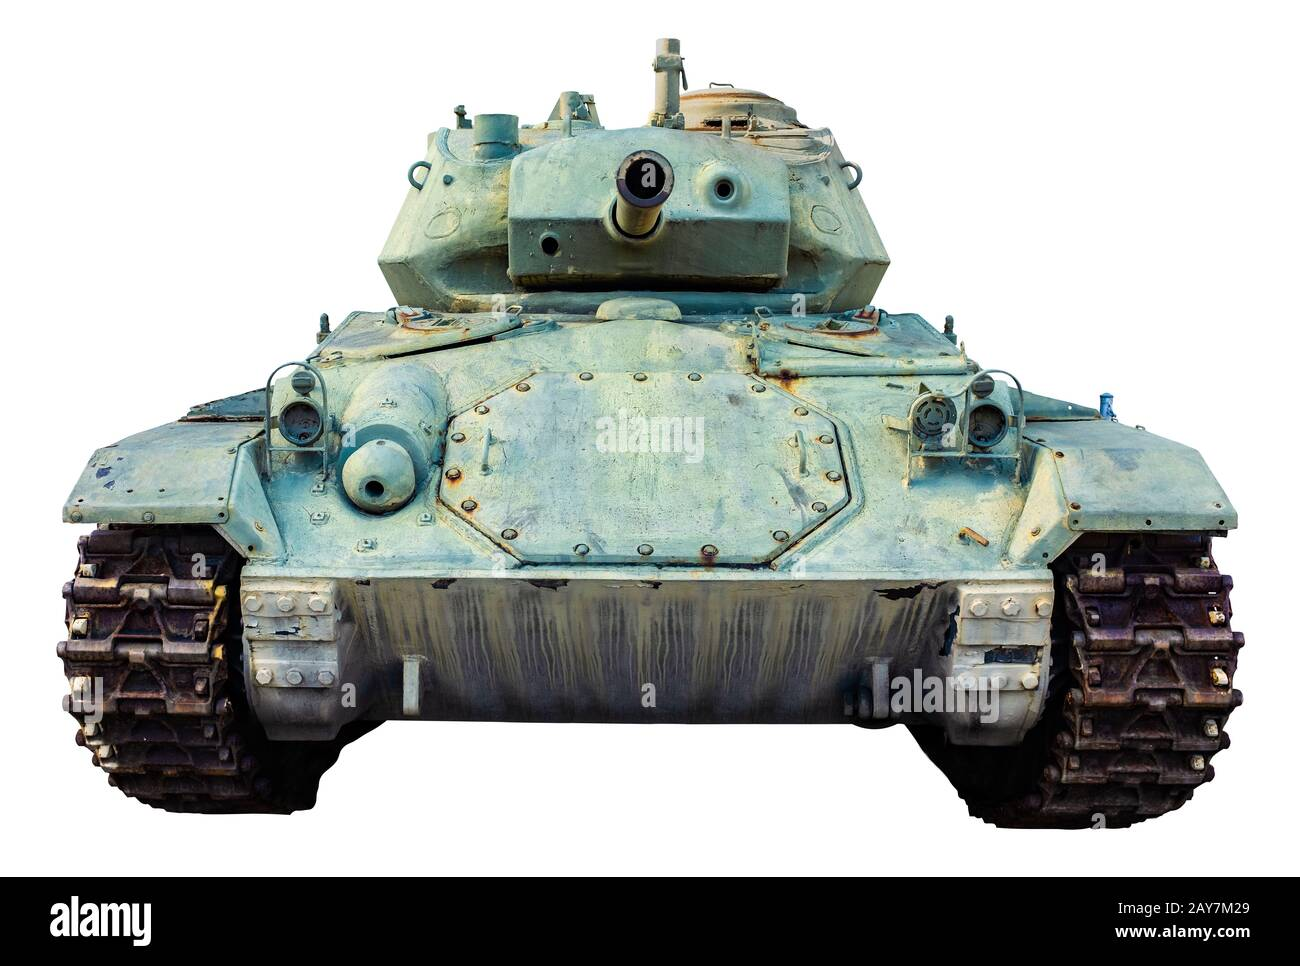 Vintage Isolated Green US Military World War II Light Tank Stock Photo